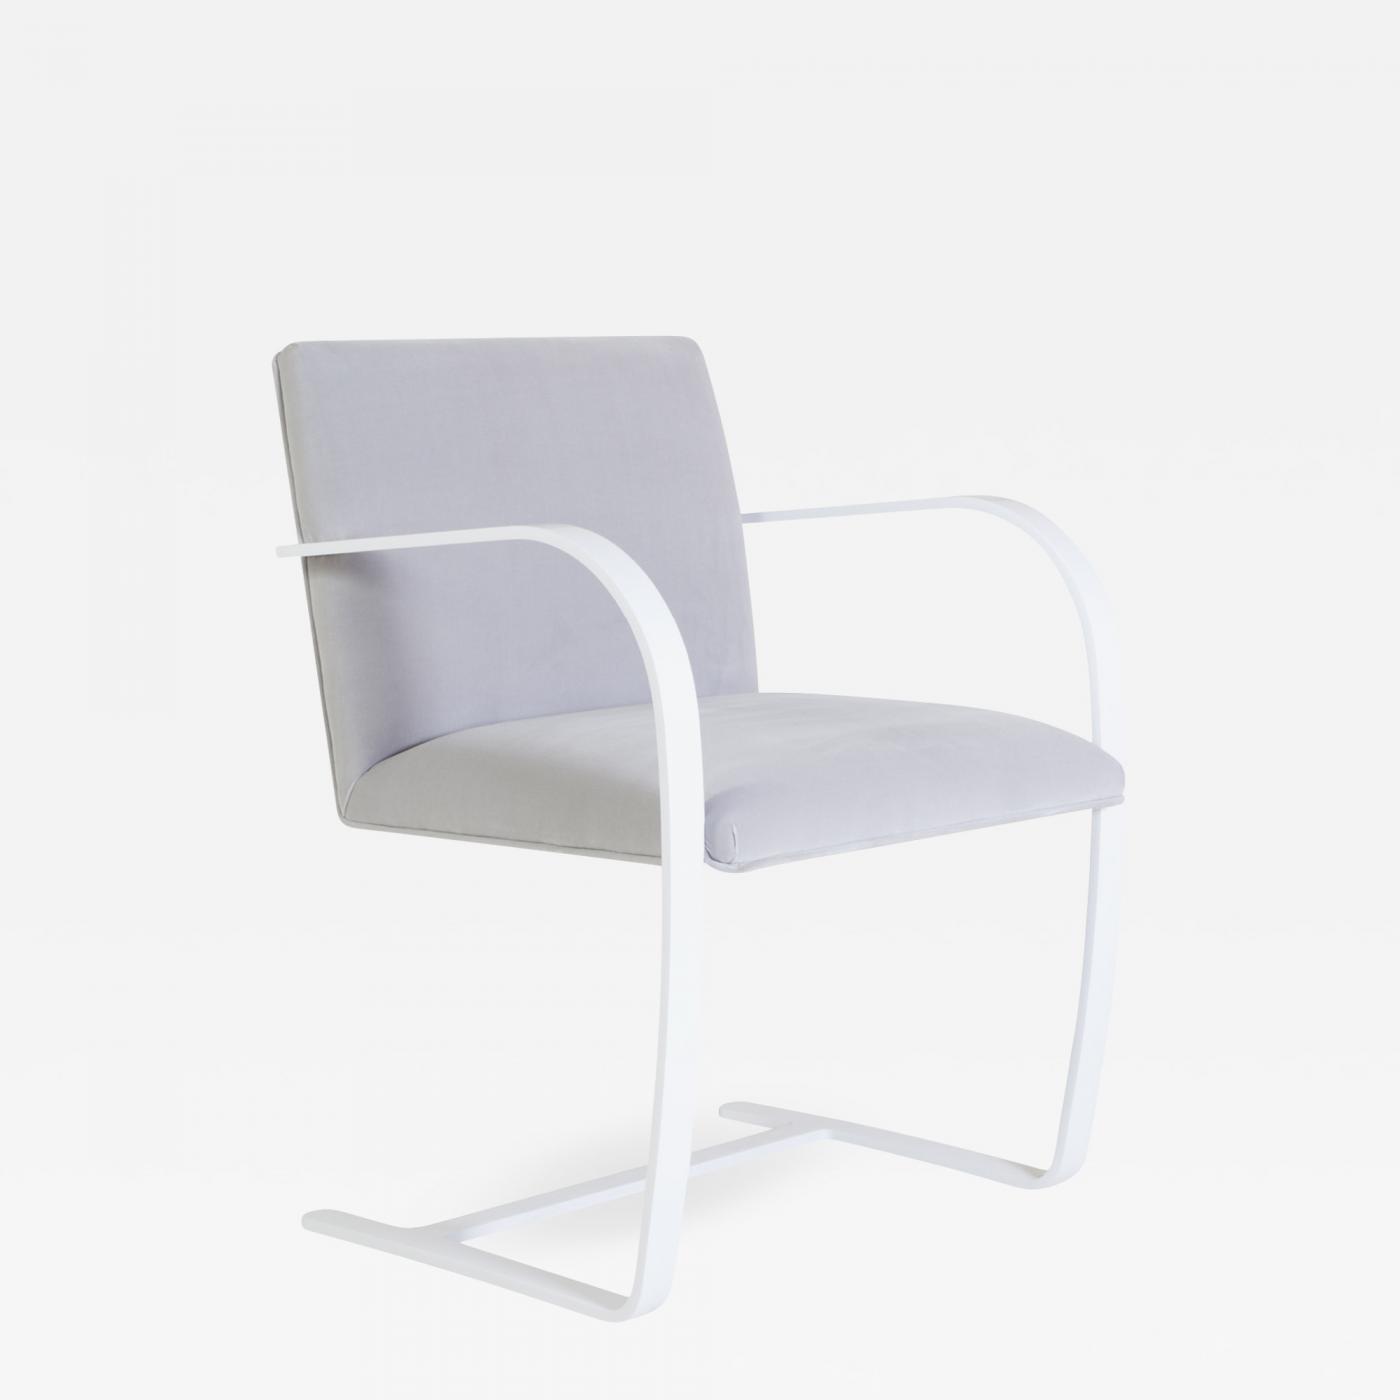 van der rohe furniture. Listings / Furniture Seating Armchairs · Ludwig Mies Van Der Rohe Van Der Rohe Furniture